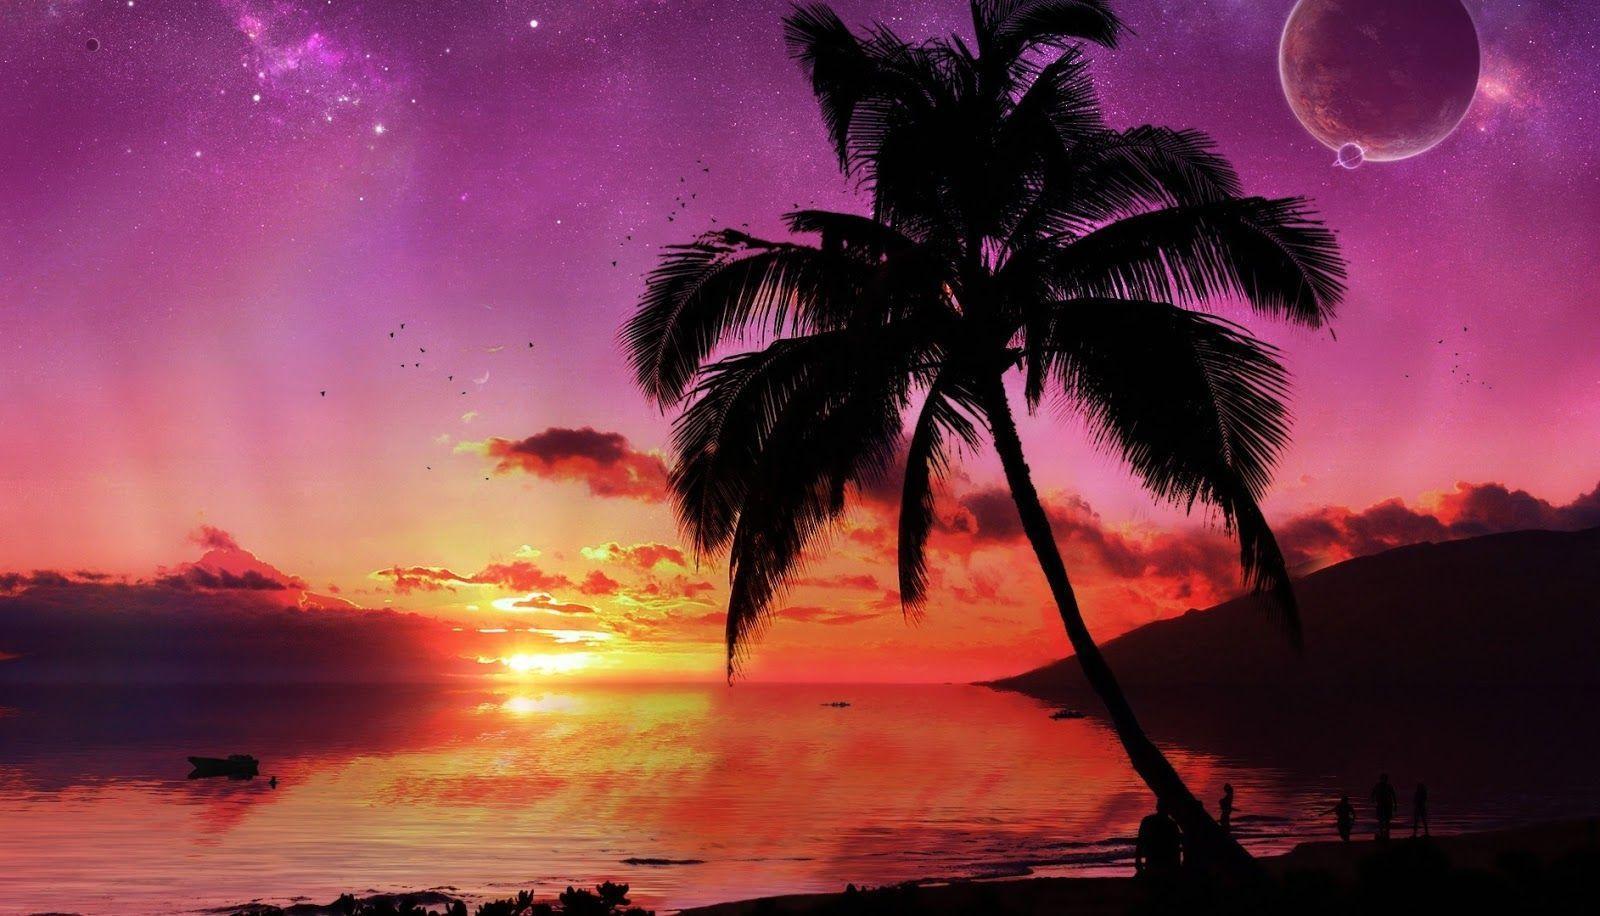 tropical island sunset wallpapers wallpaper cave. Black Bedroom Furniture Sets. Home Design Ideas